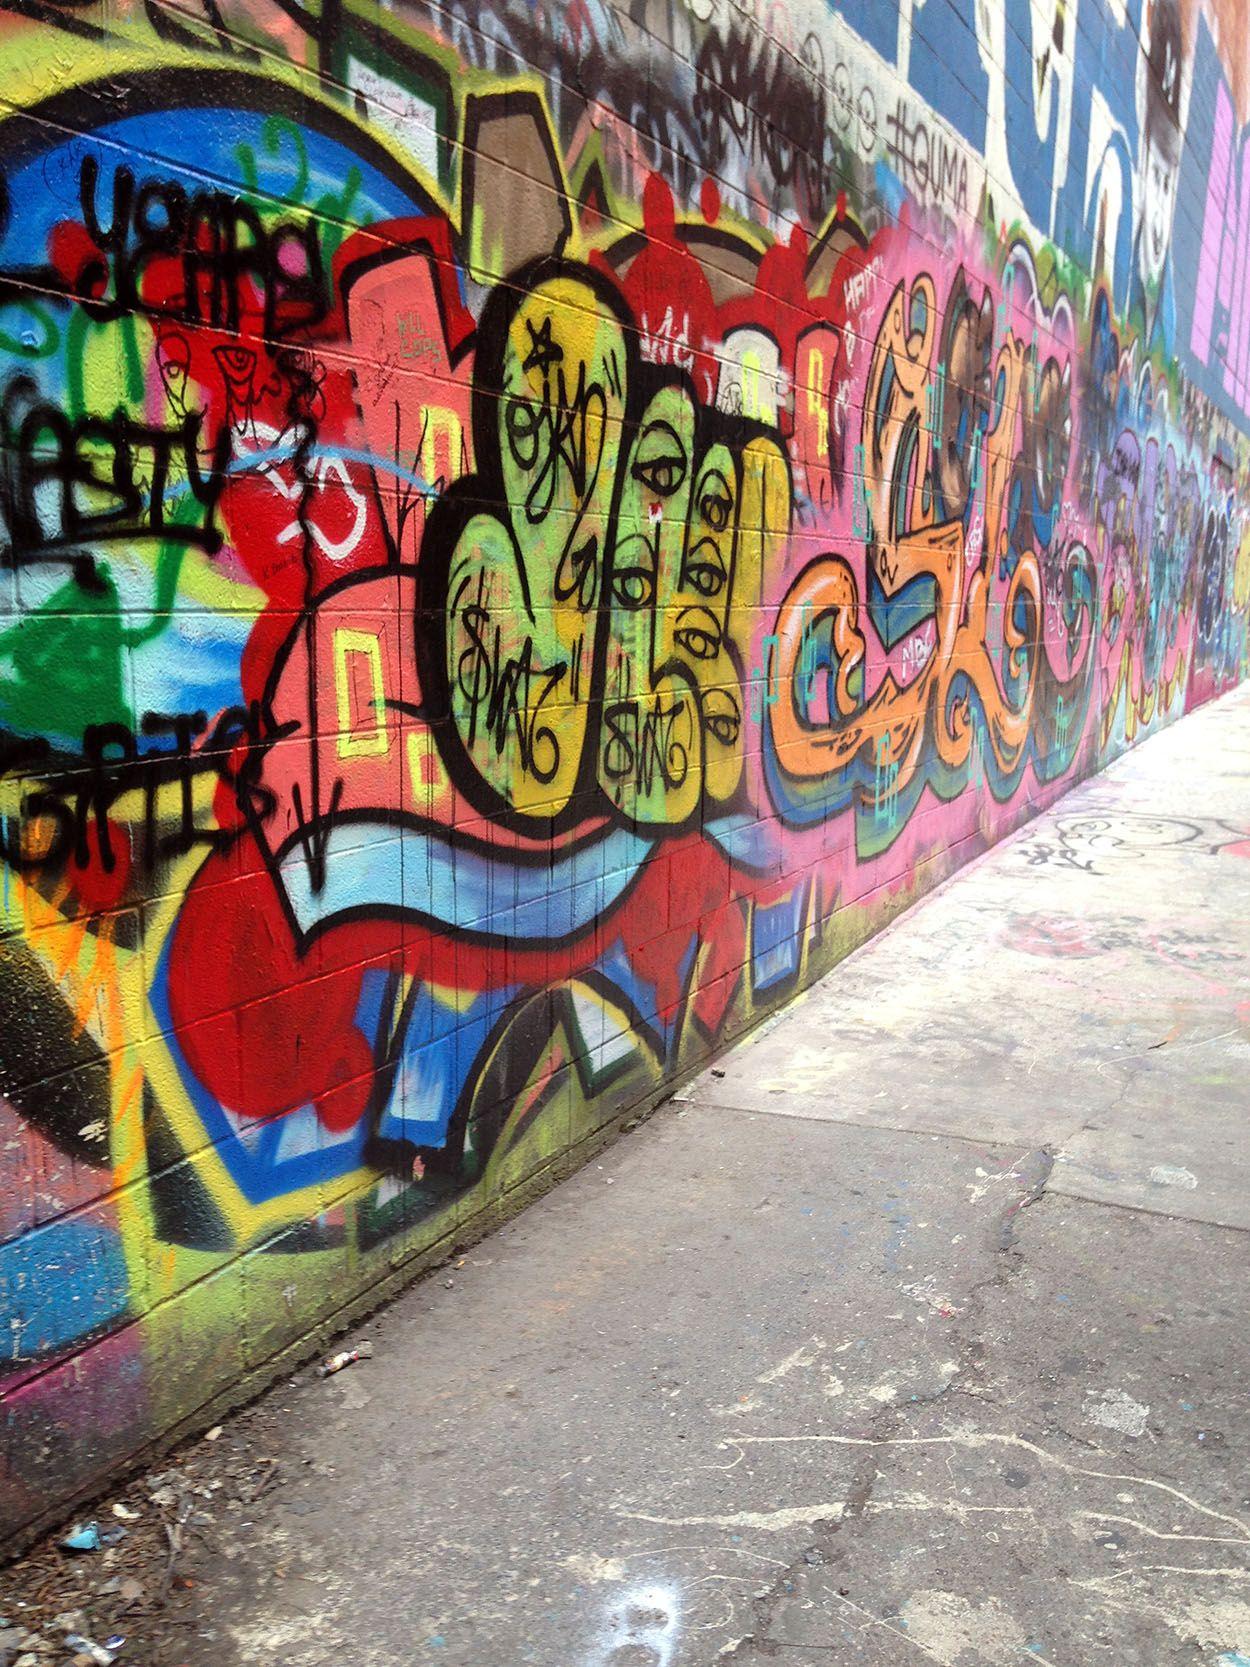 Graffiti wall ann arbor - Graffiti Alley Polka Dots And Picket Fences Family Times Pinterest Dots Fence And Polka Dots